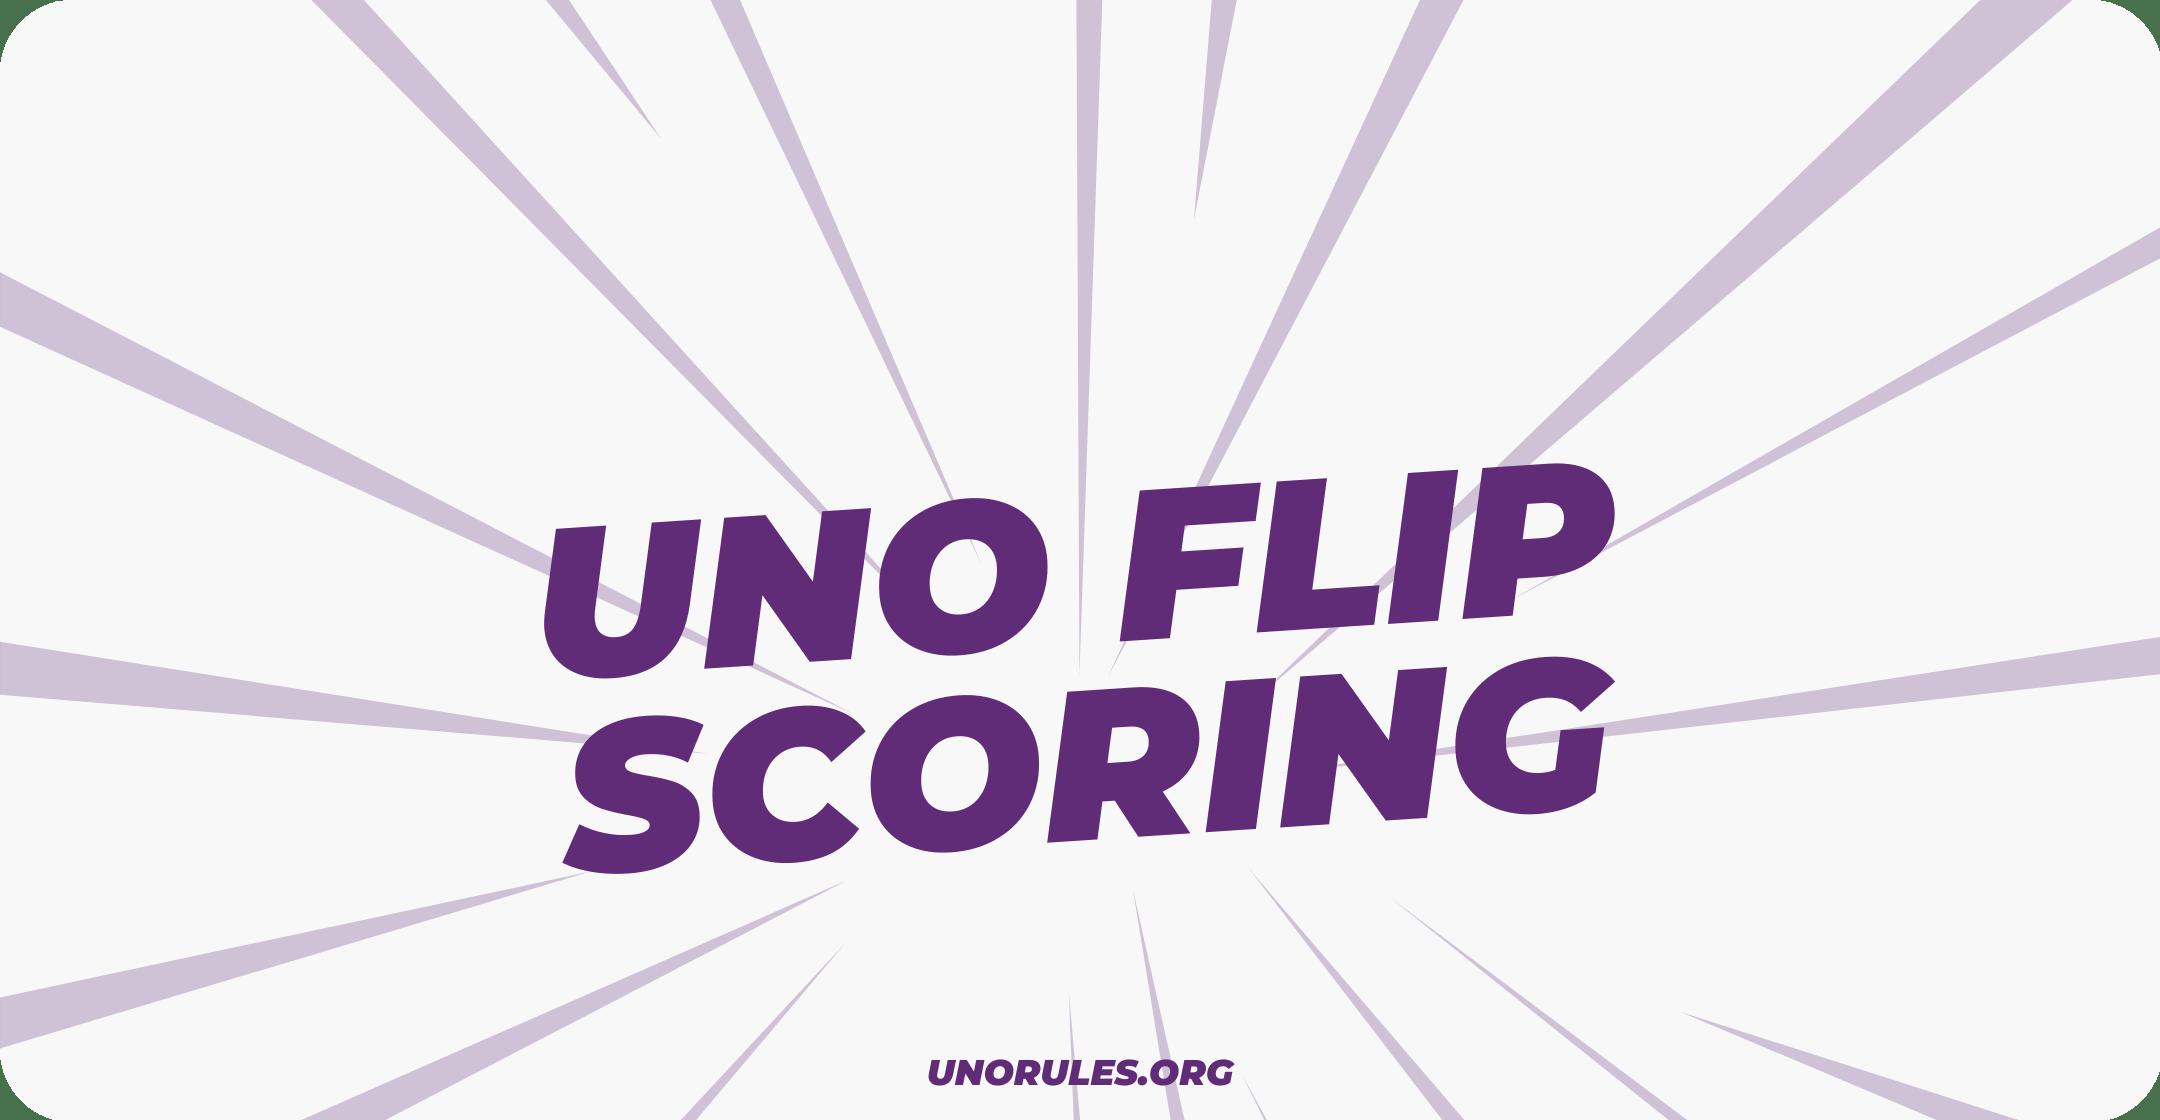 Uno Flip scoring